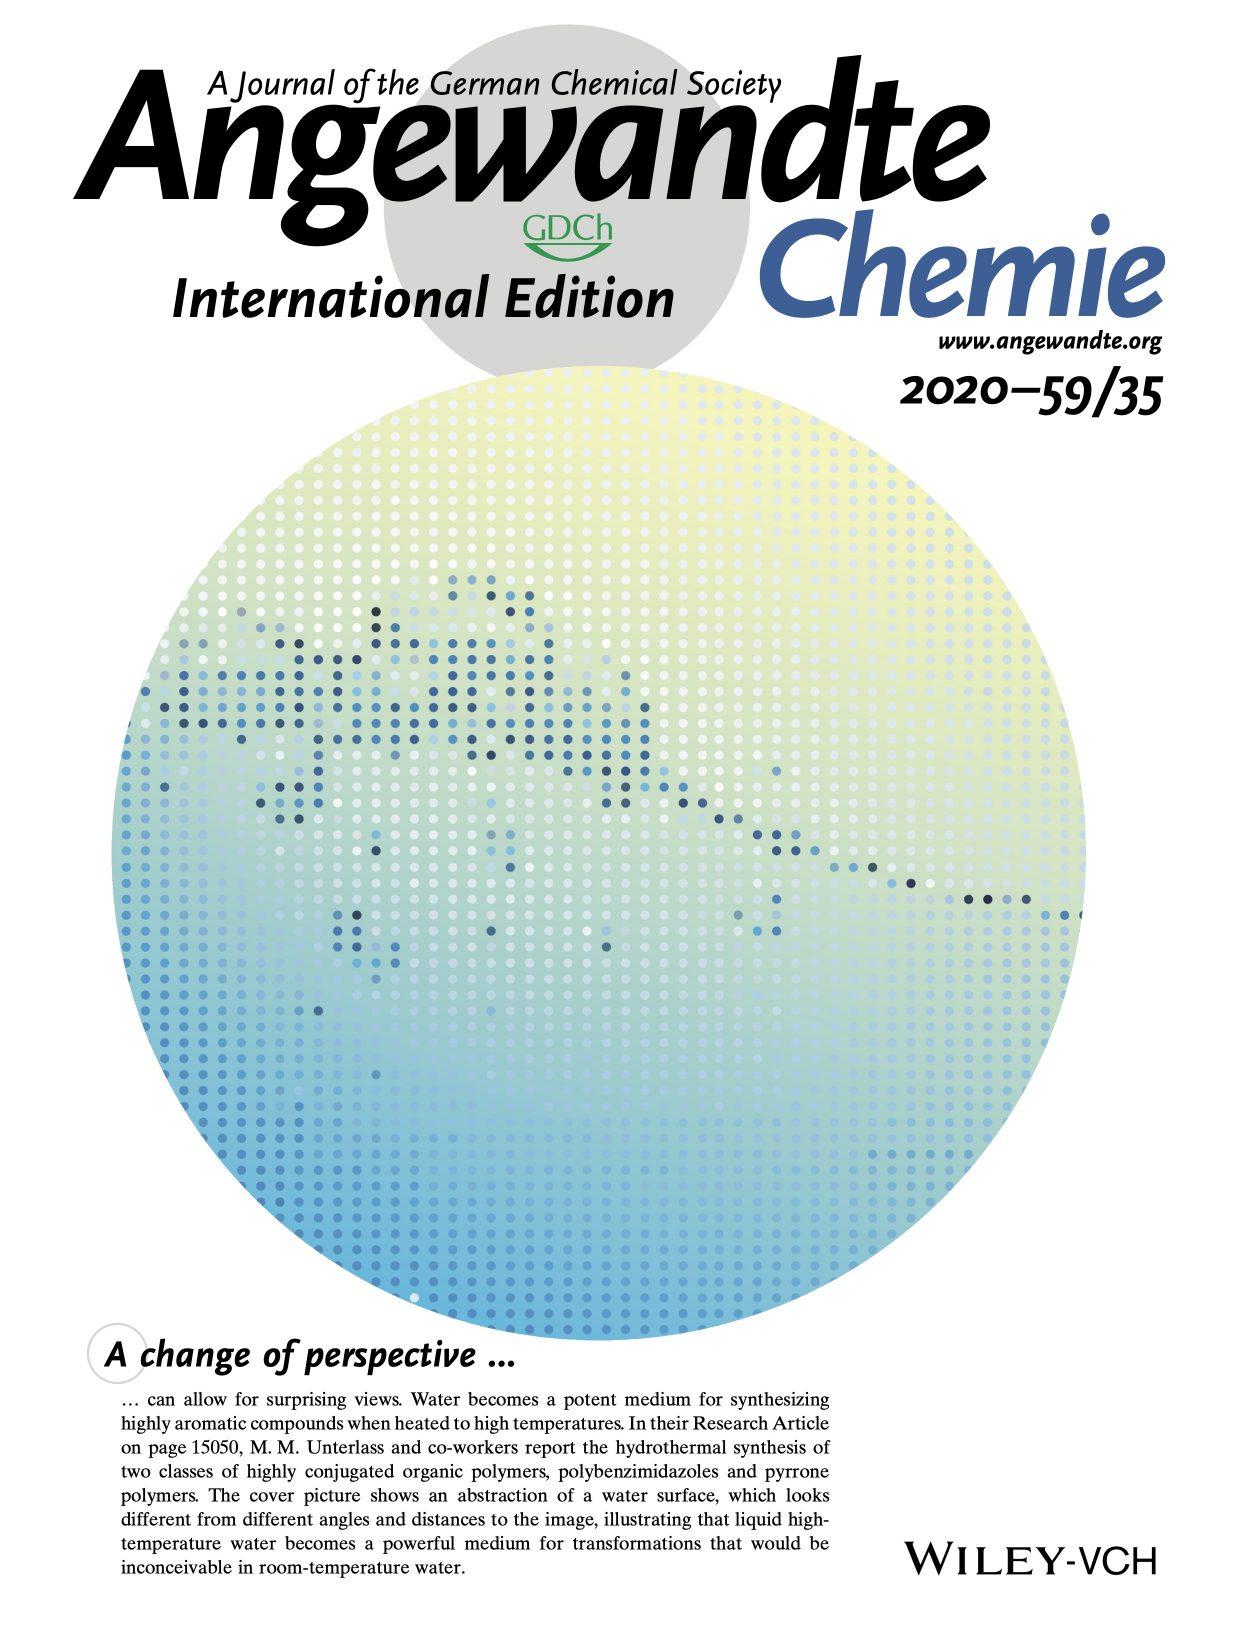 Angewandte Chemie International Edition